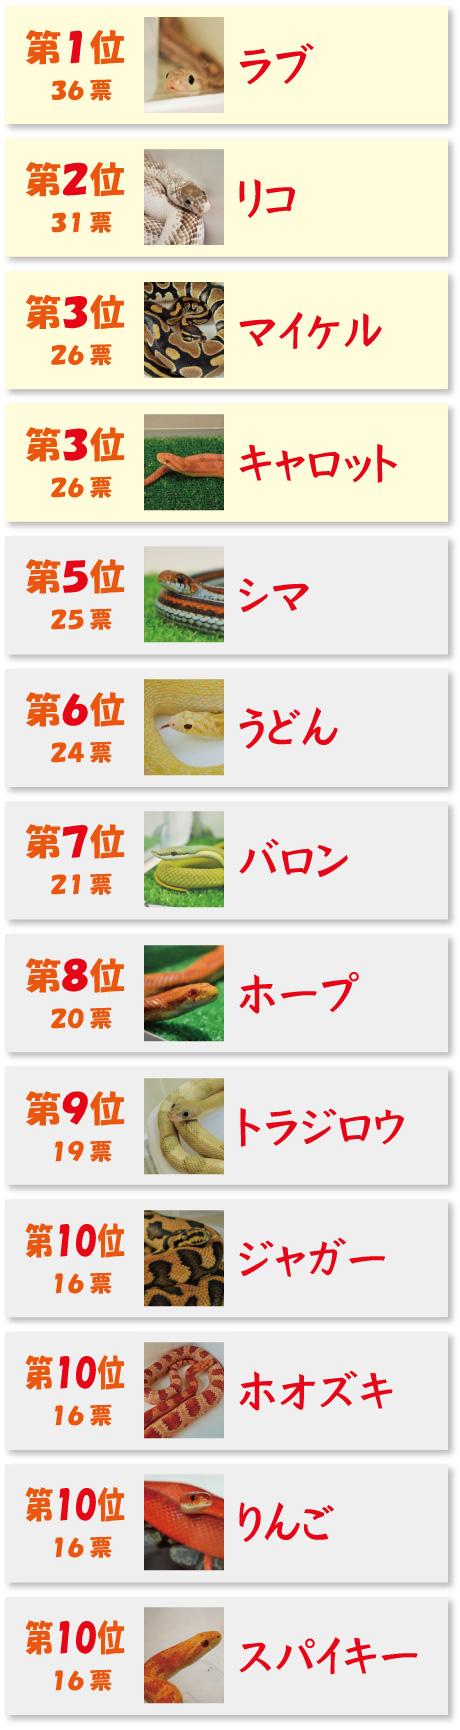 web_senkyo_chukan01-10